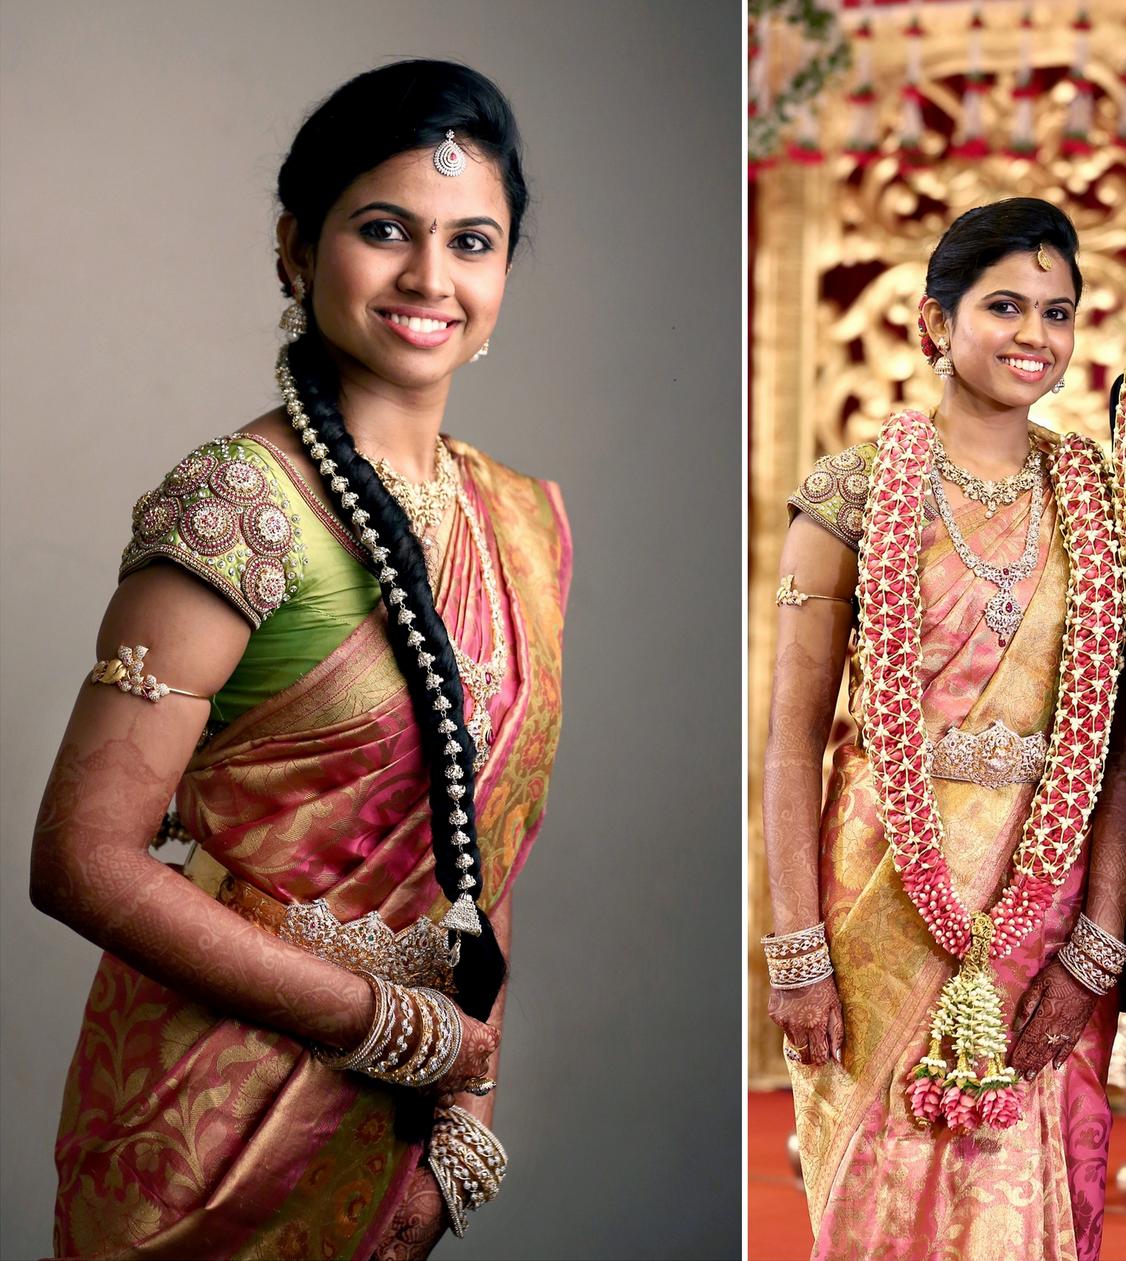 Wedding Hairstyle In Tamil: #southindian #wedding #hindu #tamil